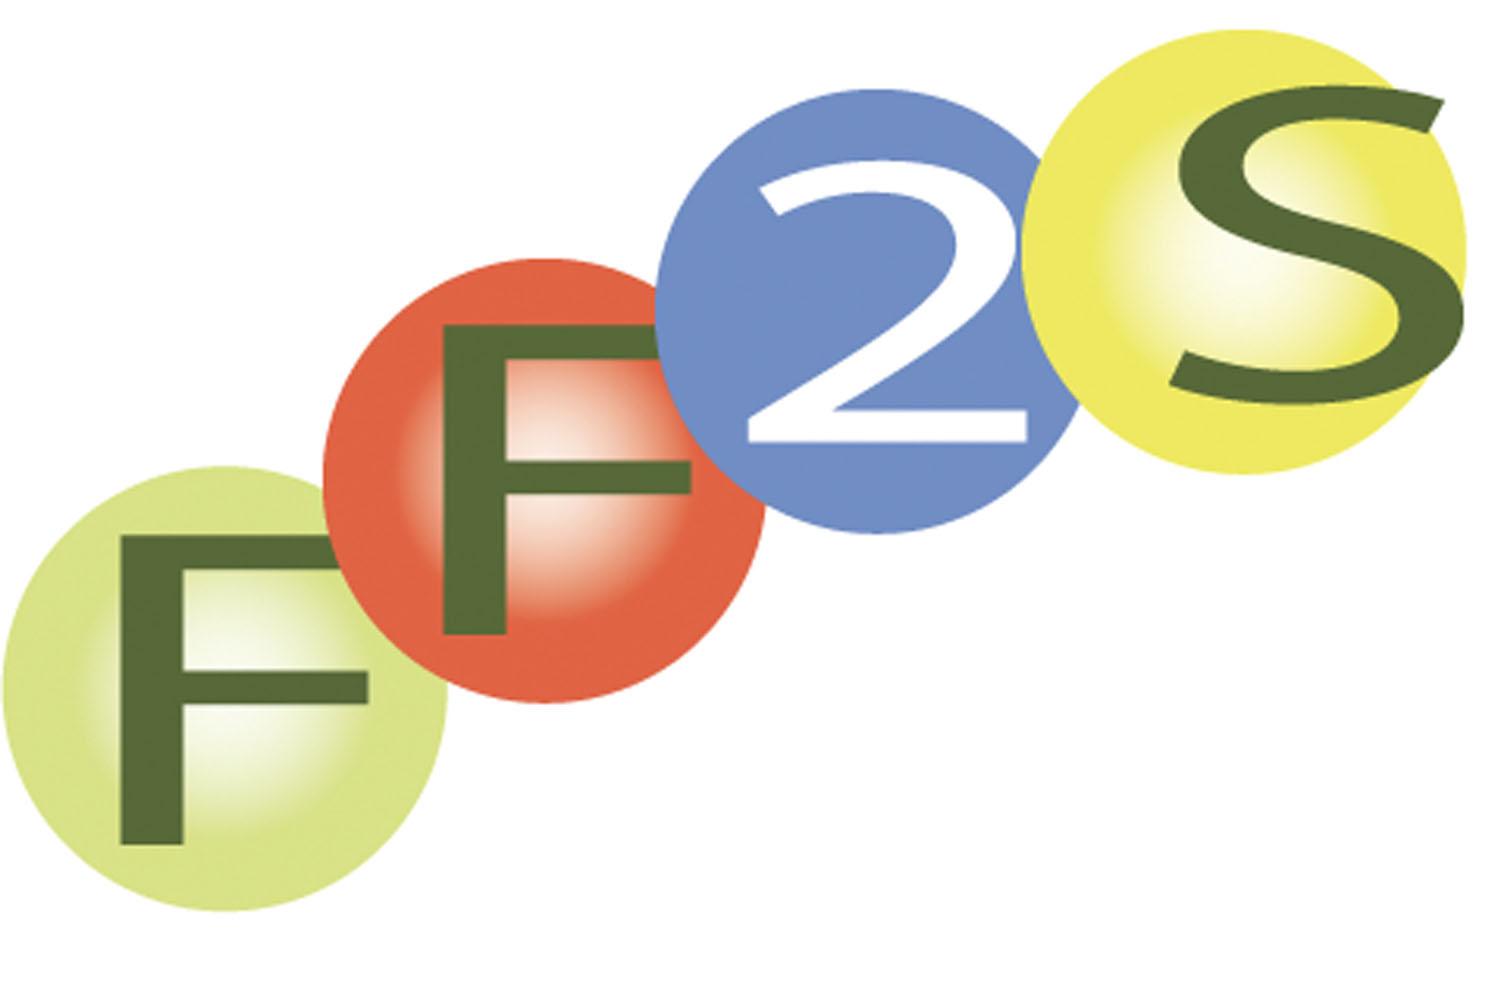 ff2s association